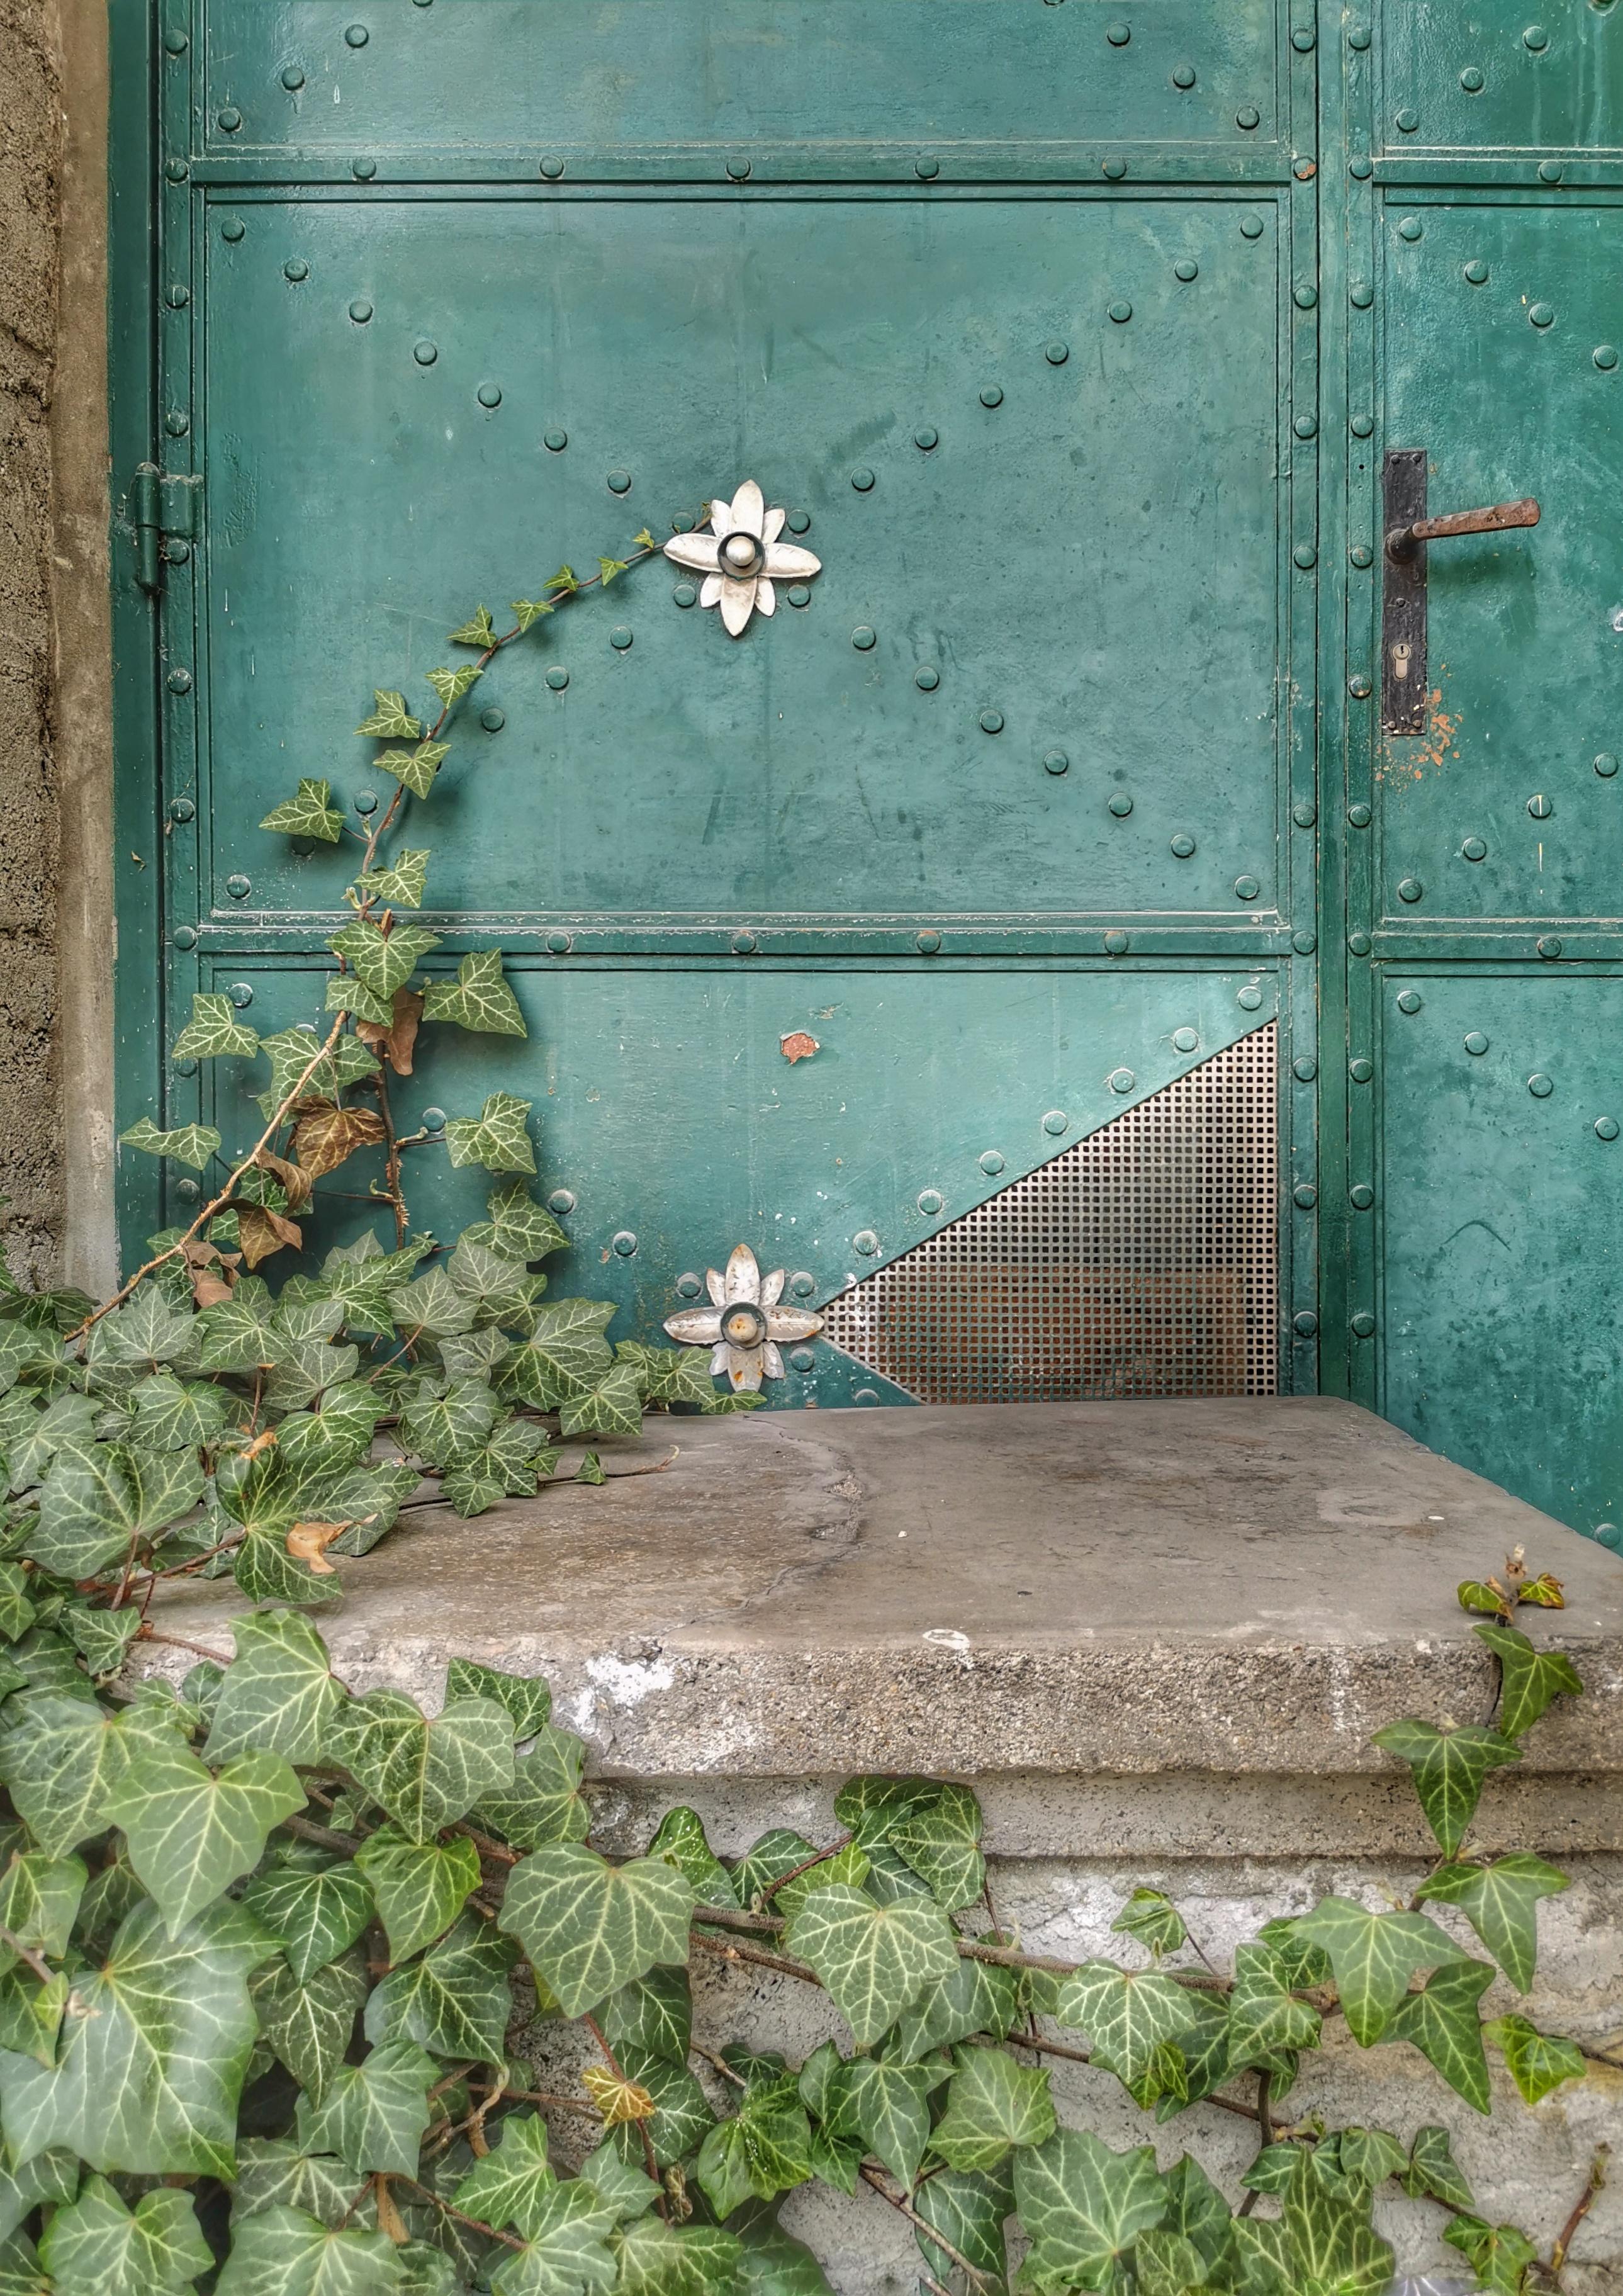 Ivy ranks along a door